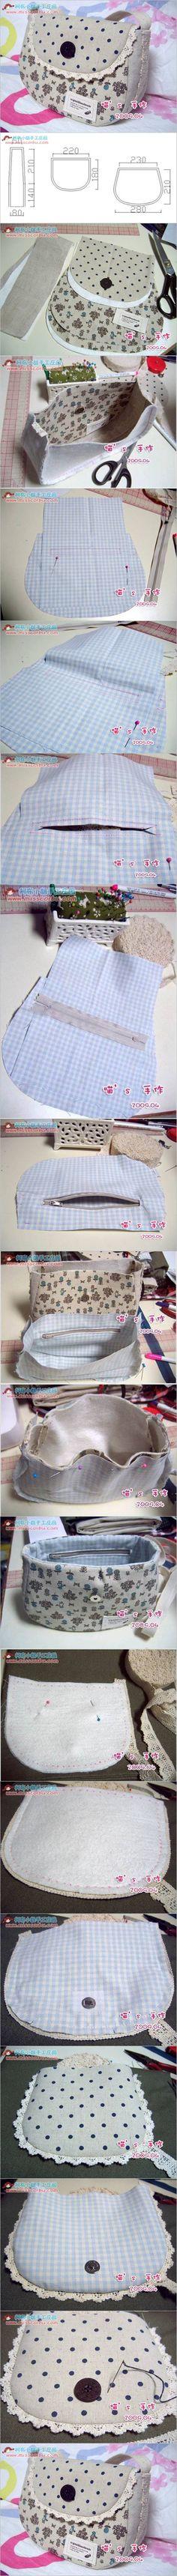 DIY How to Sew a Simple Summer Handbag | Handtasche nähen, Sommer ...